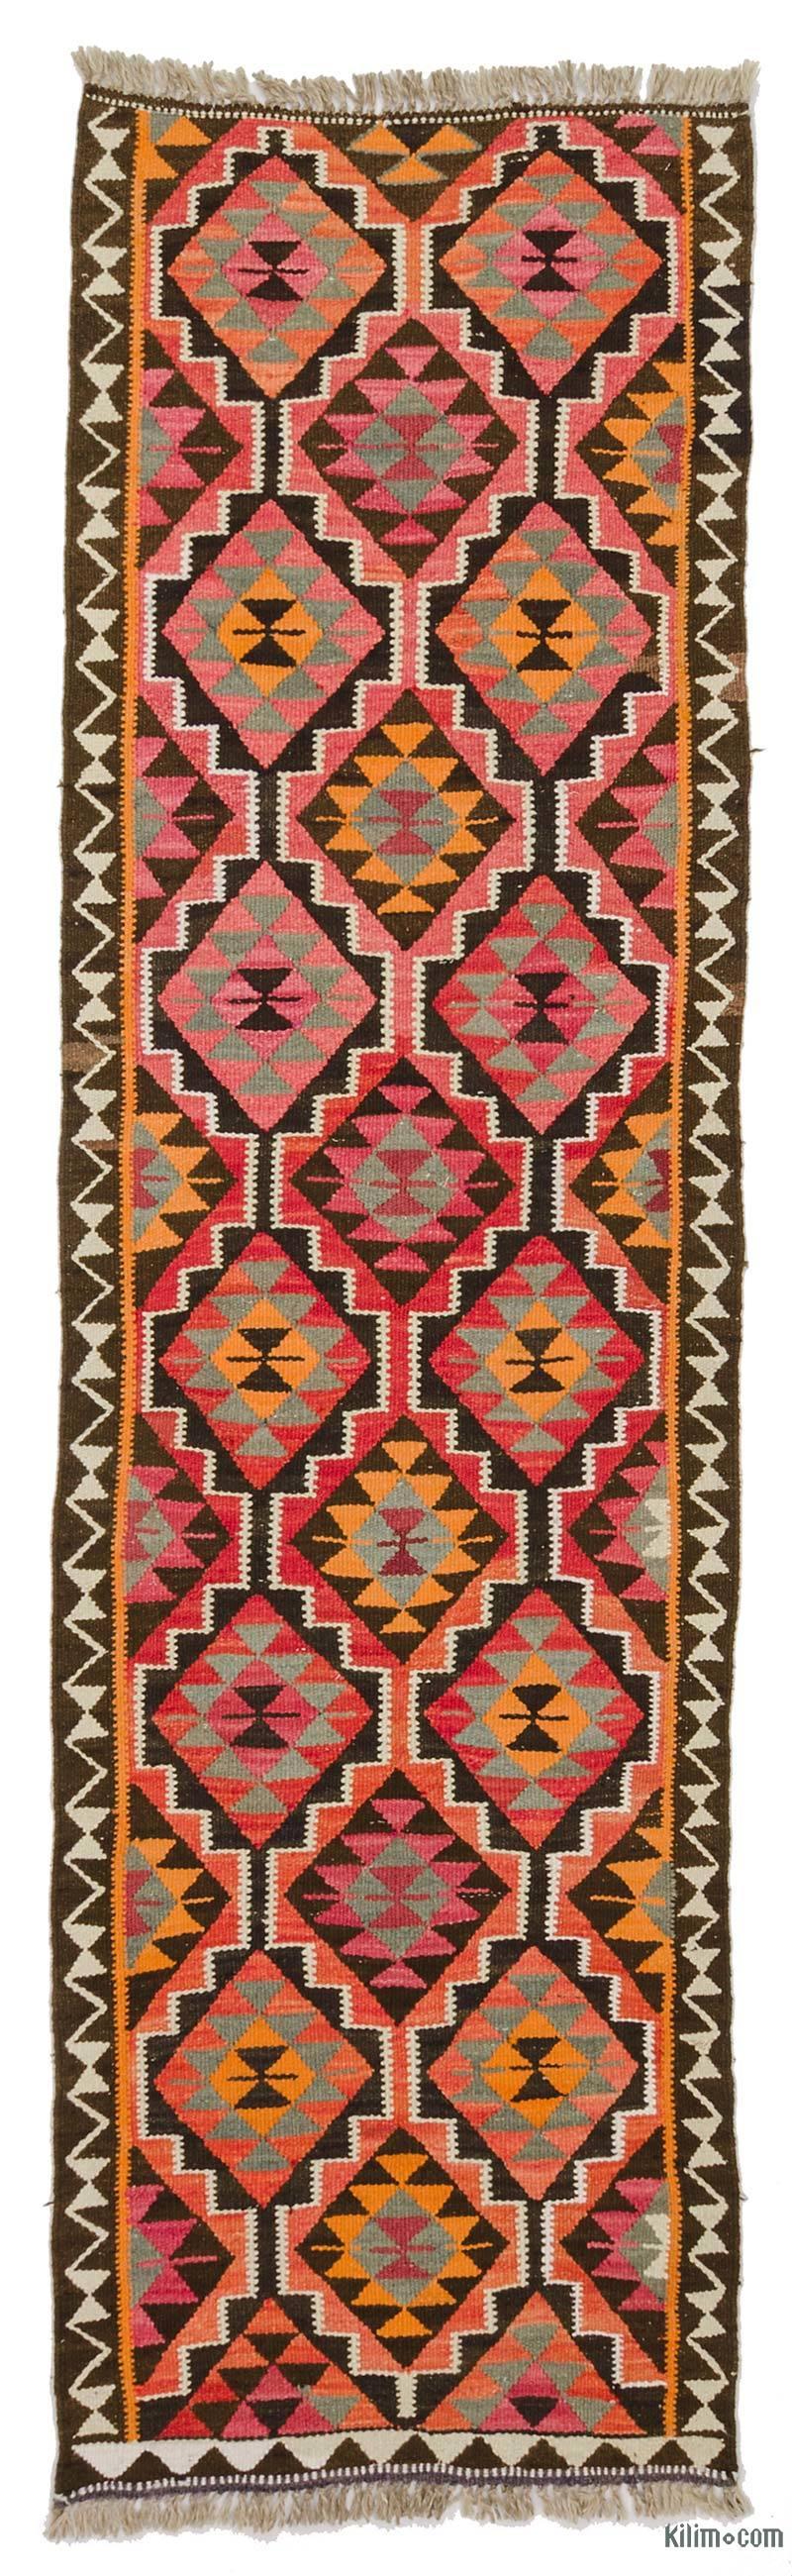 "Multicolor Vintage Turkish Kilim Runner - 2' 11"" x 10' 4"" (35 in. x 124 in.) - K0034213"